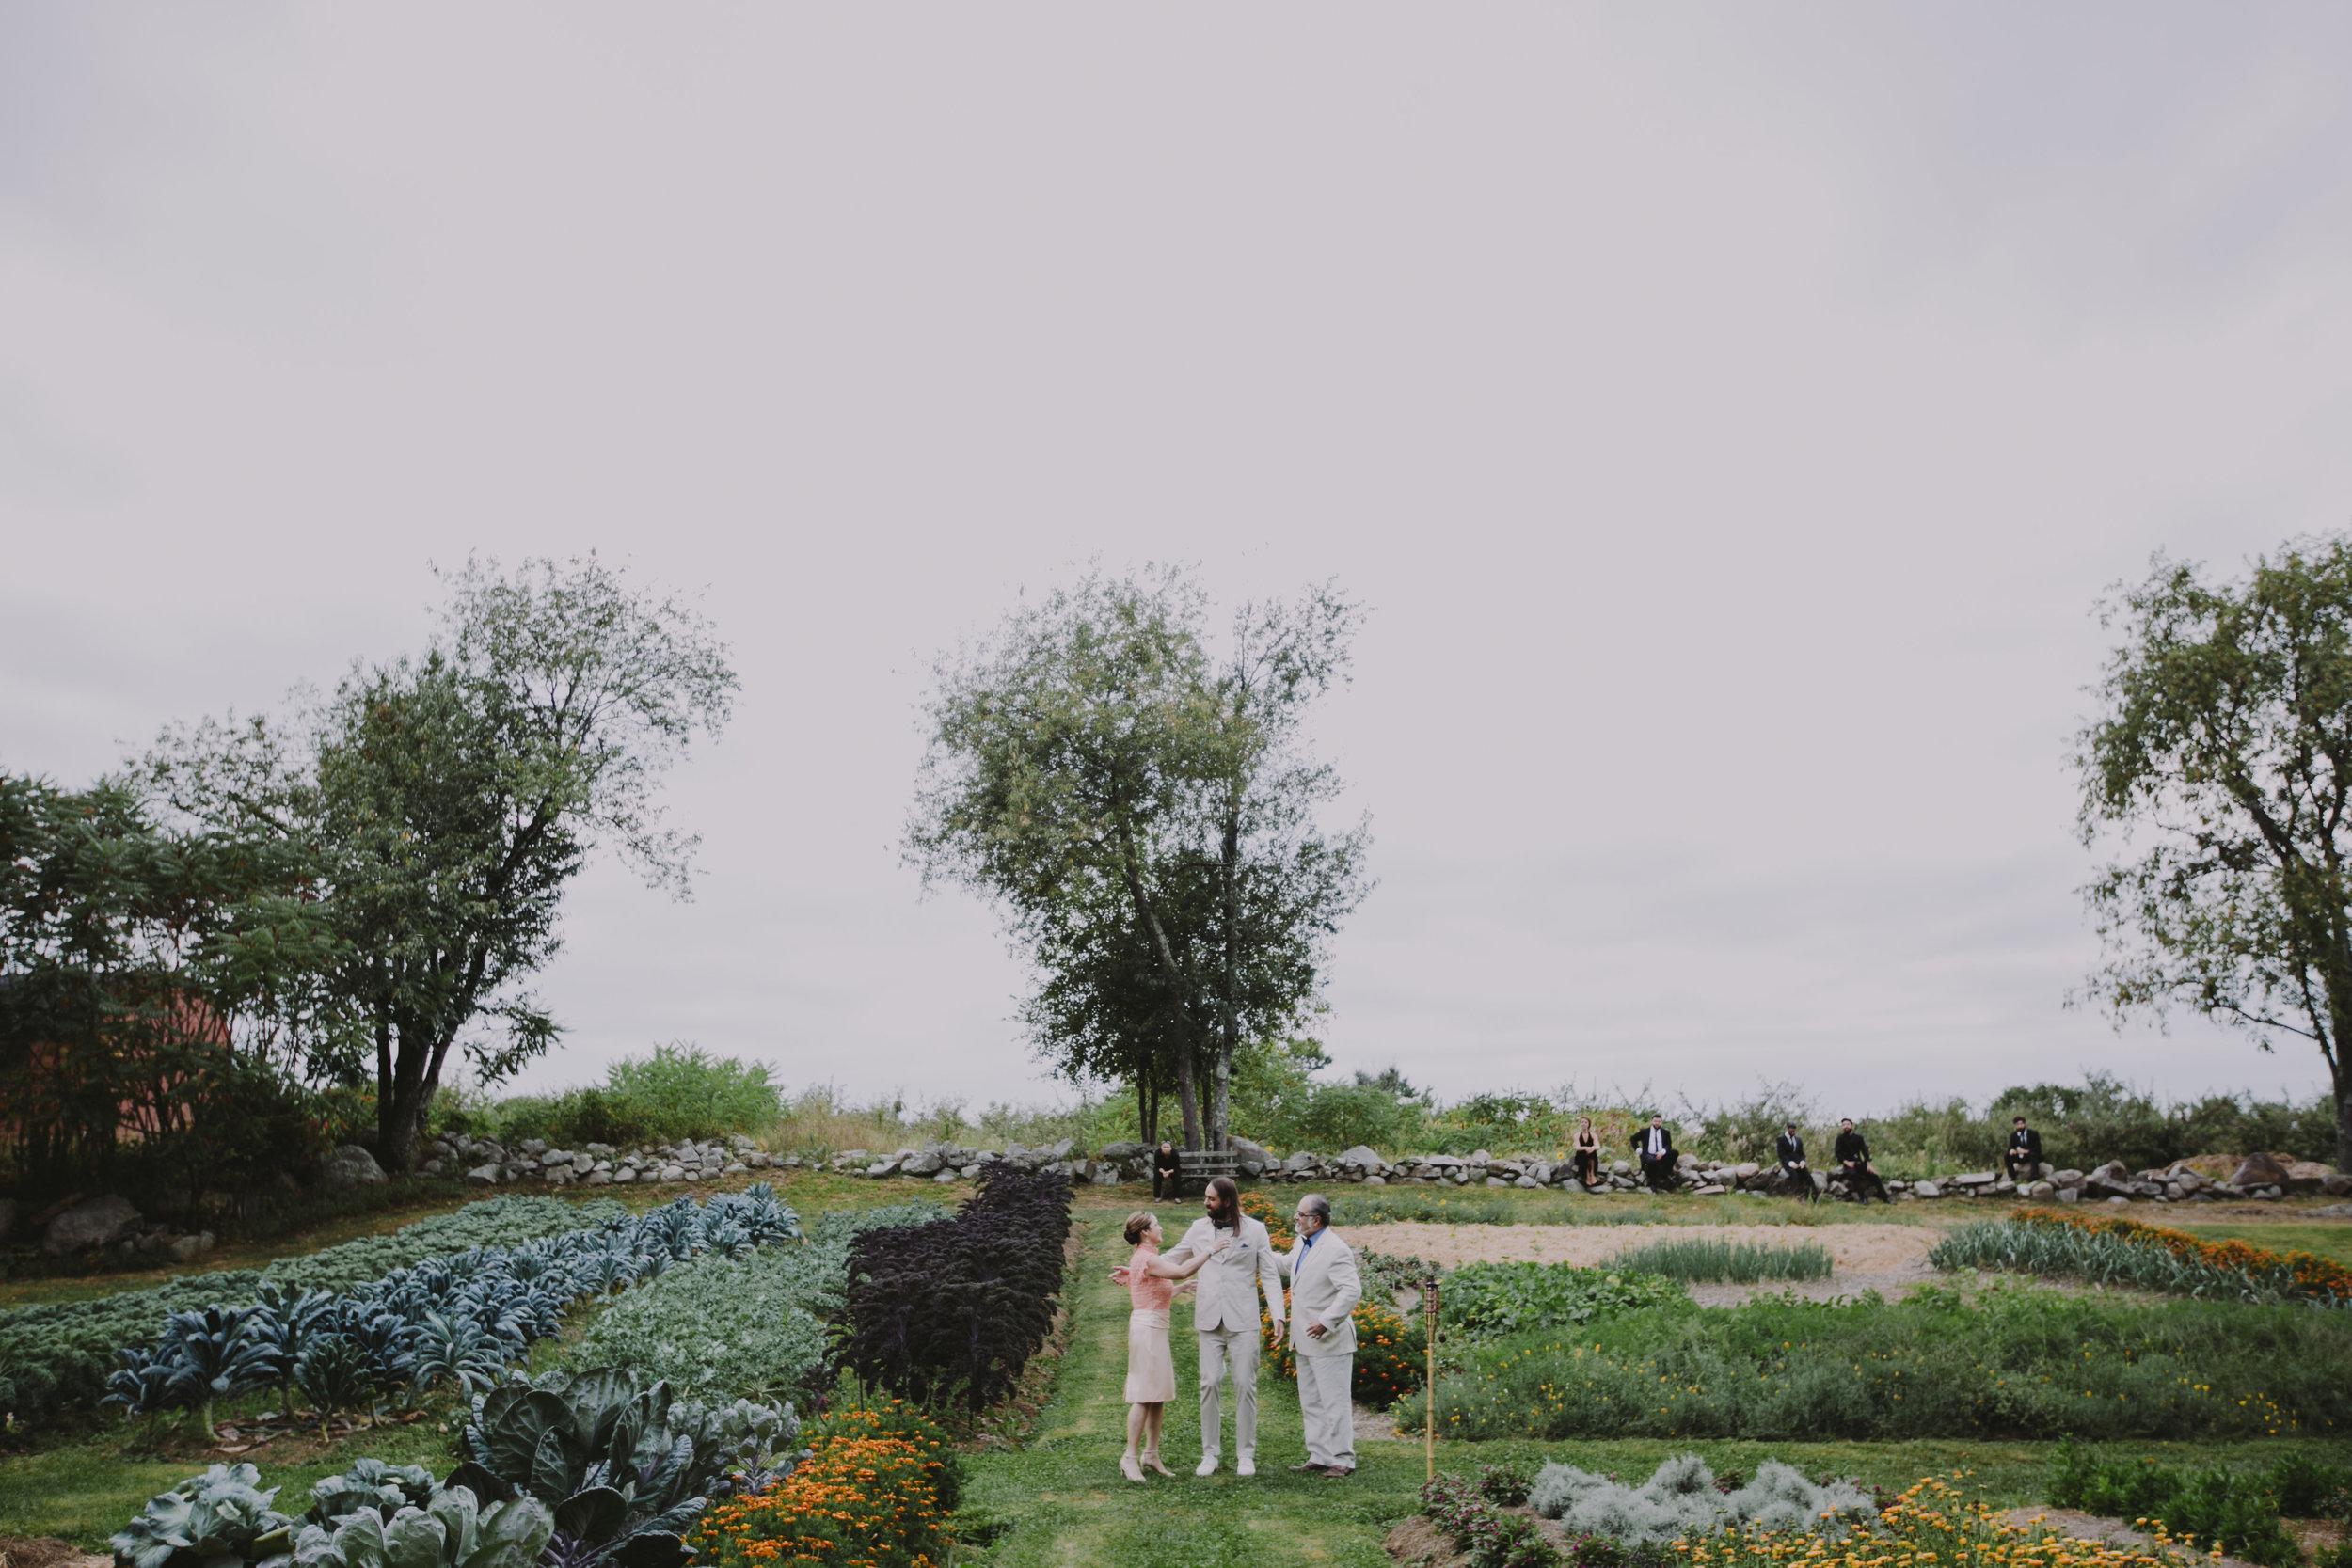 LIBERTY_VIEW_FARM_HIGHLAND_NY_WEDDING_CHELLISE_MICHAEL_PHOTOGRAPHY827.JPG